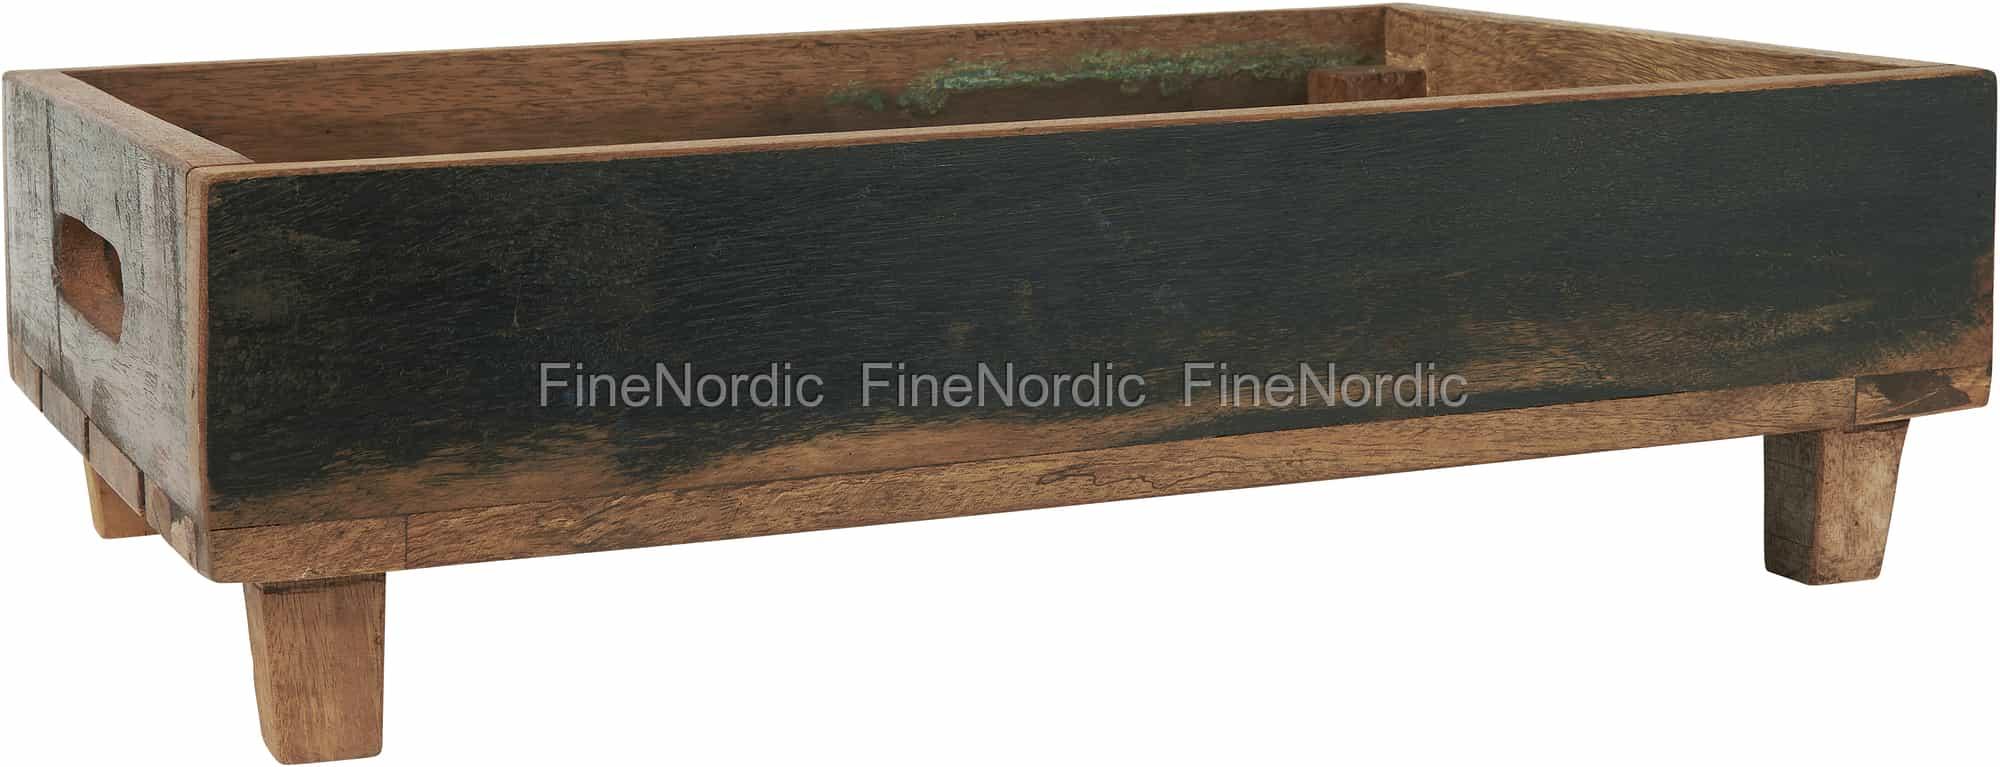 Ib Laursen Wooden Box On Feet Unique Stackable